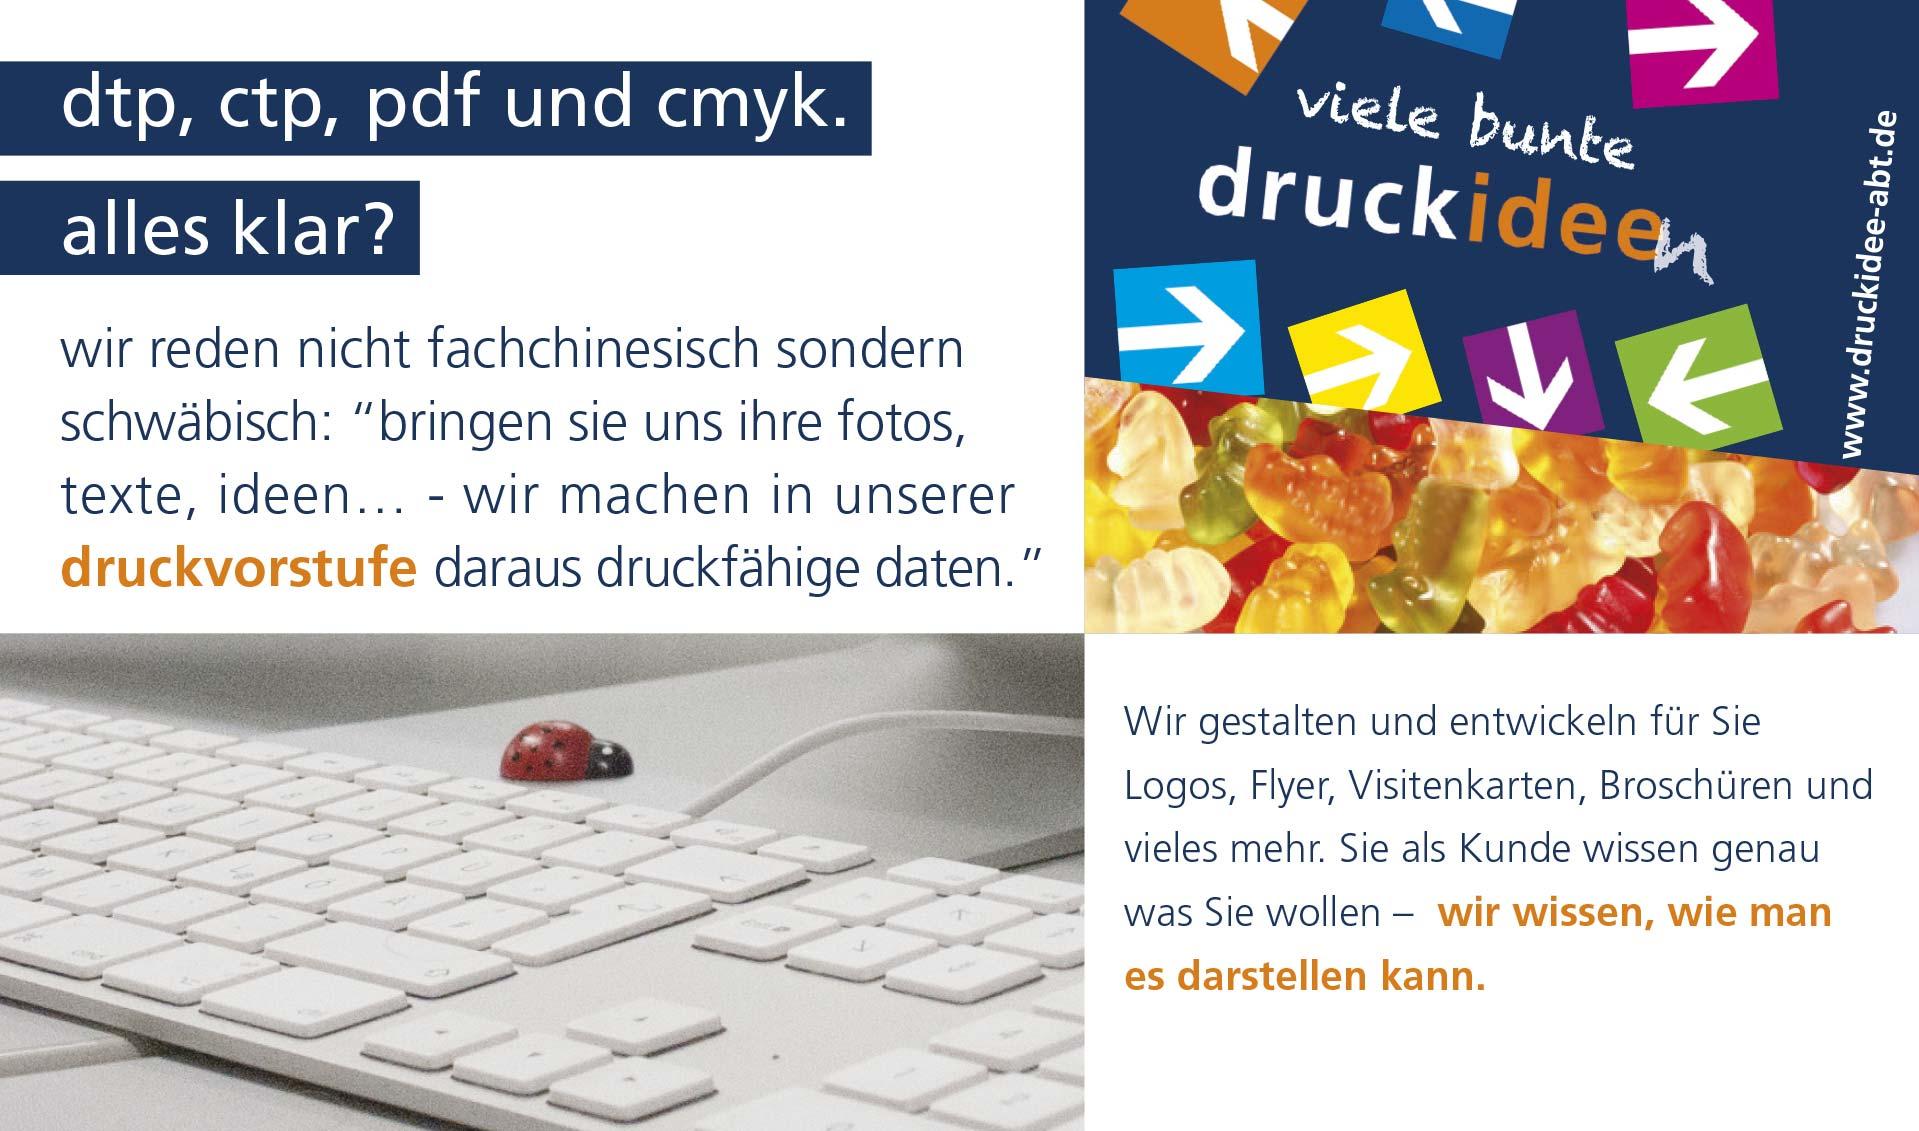 05-druckidee-abt